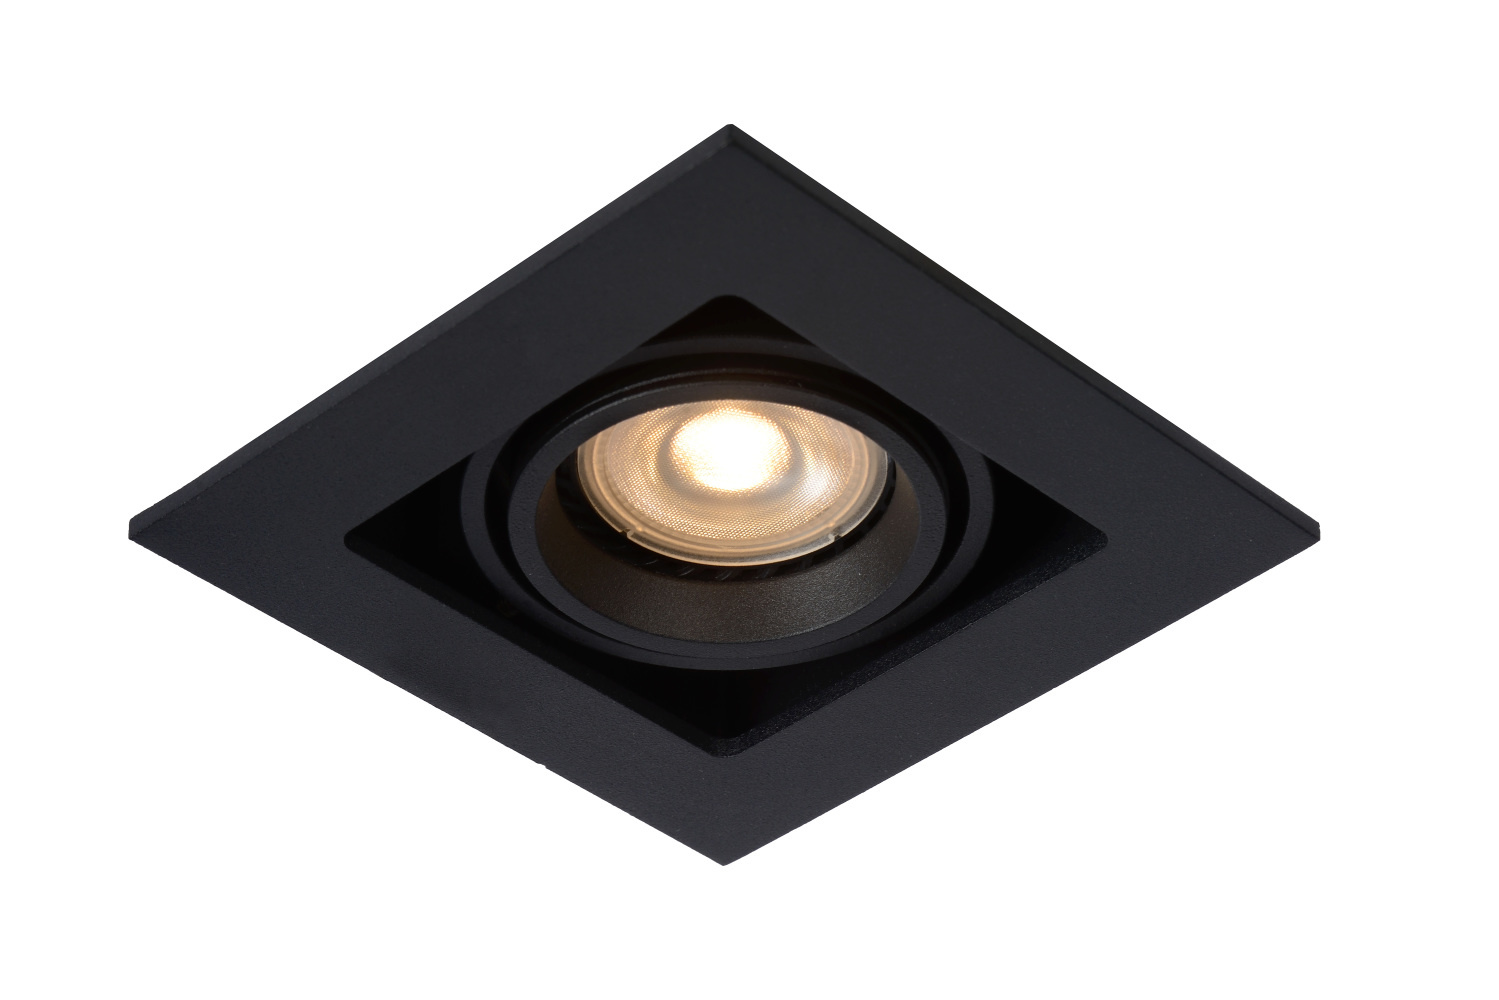 Lucide CHIMNEY Inbouwspot GU10 50W Vierkant Zwart